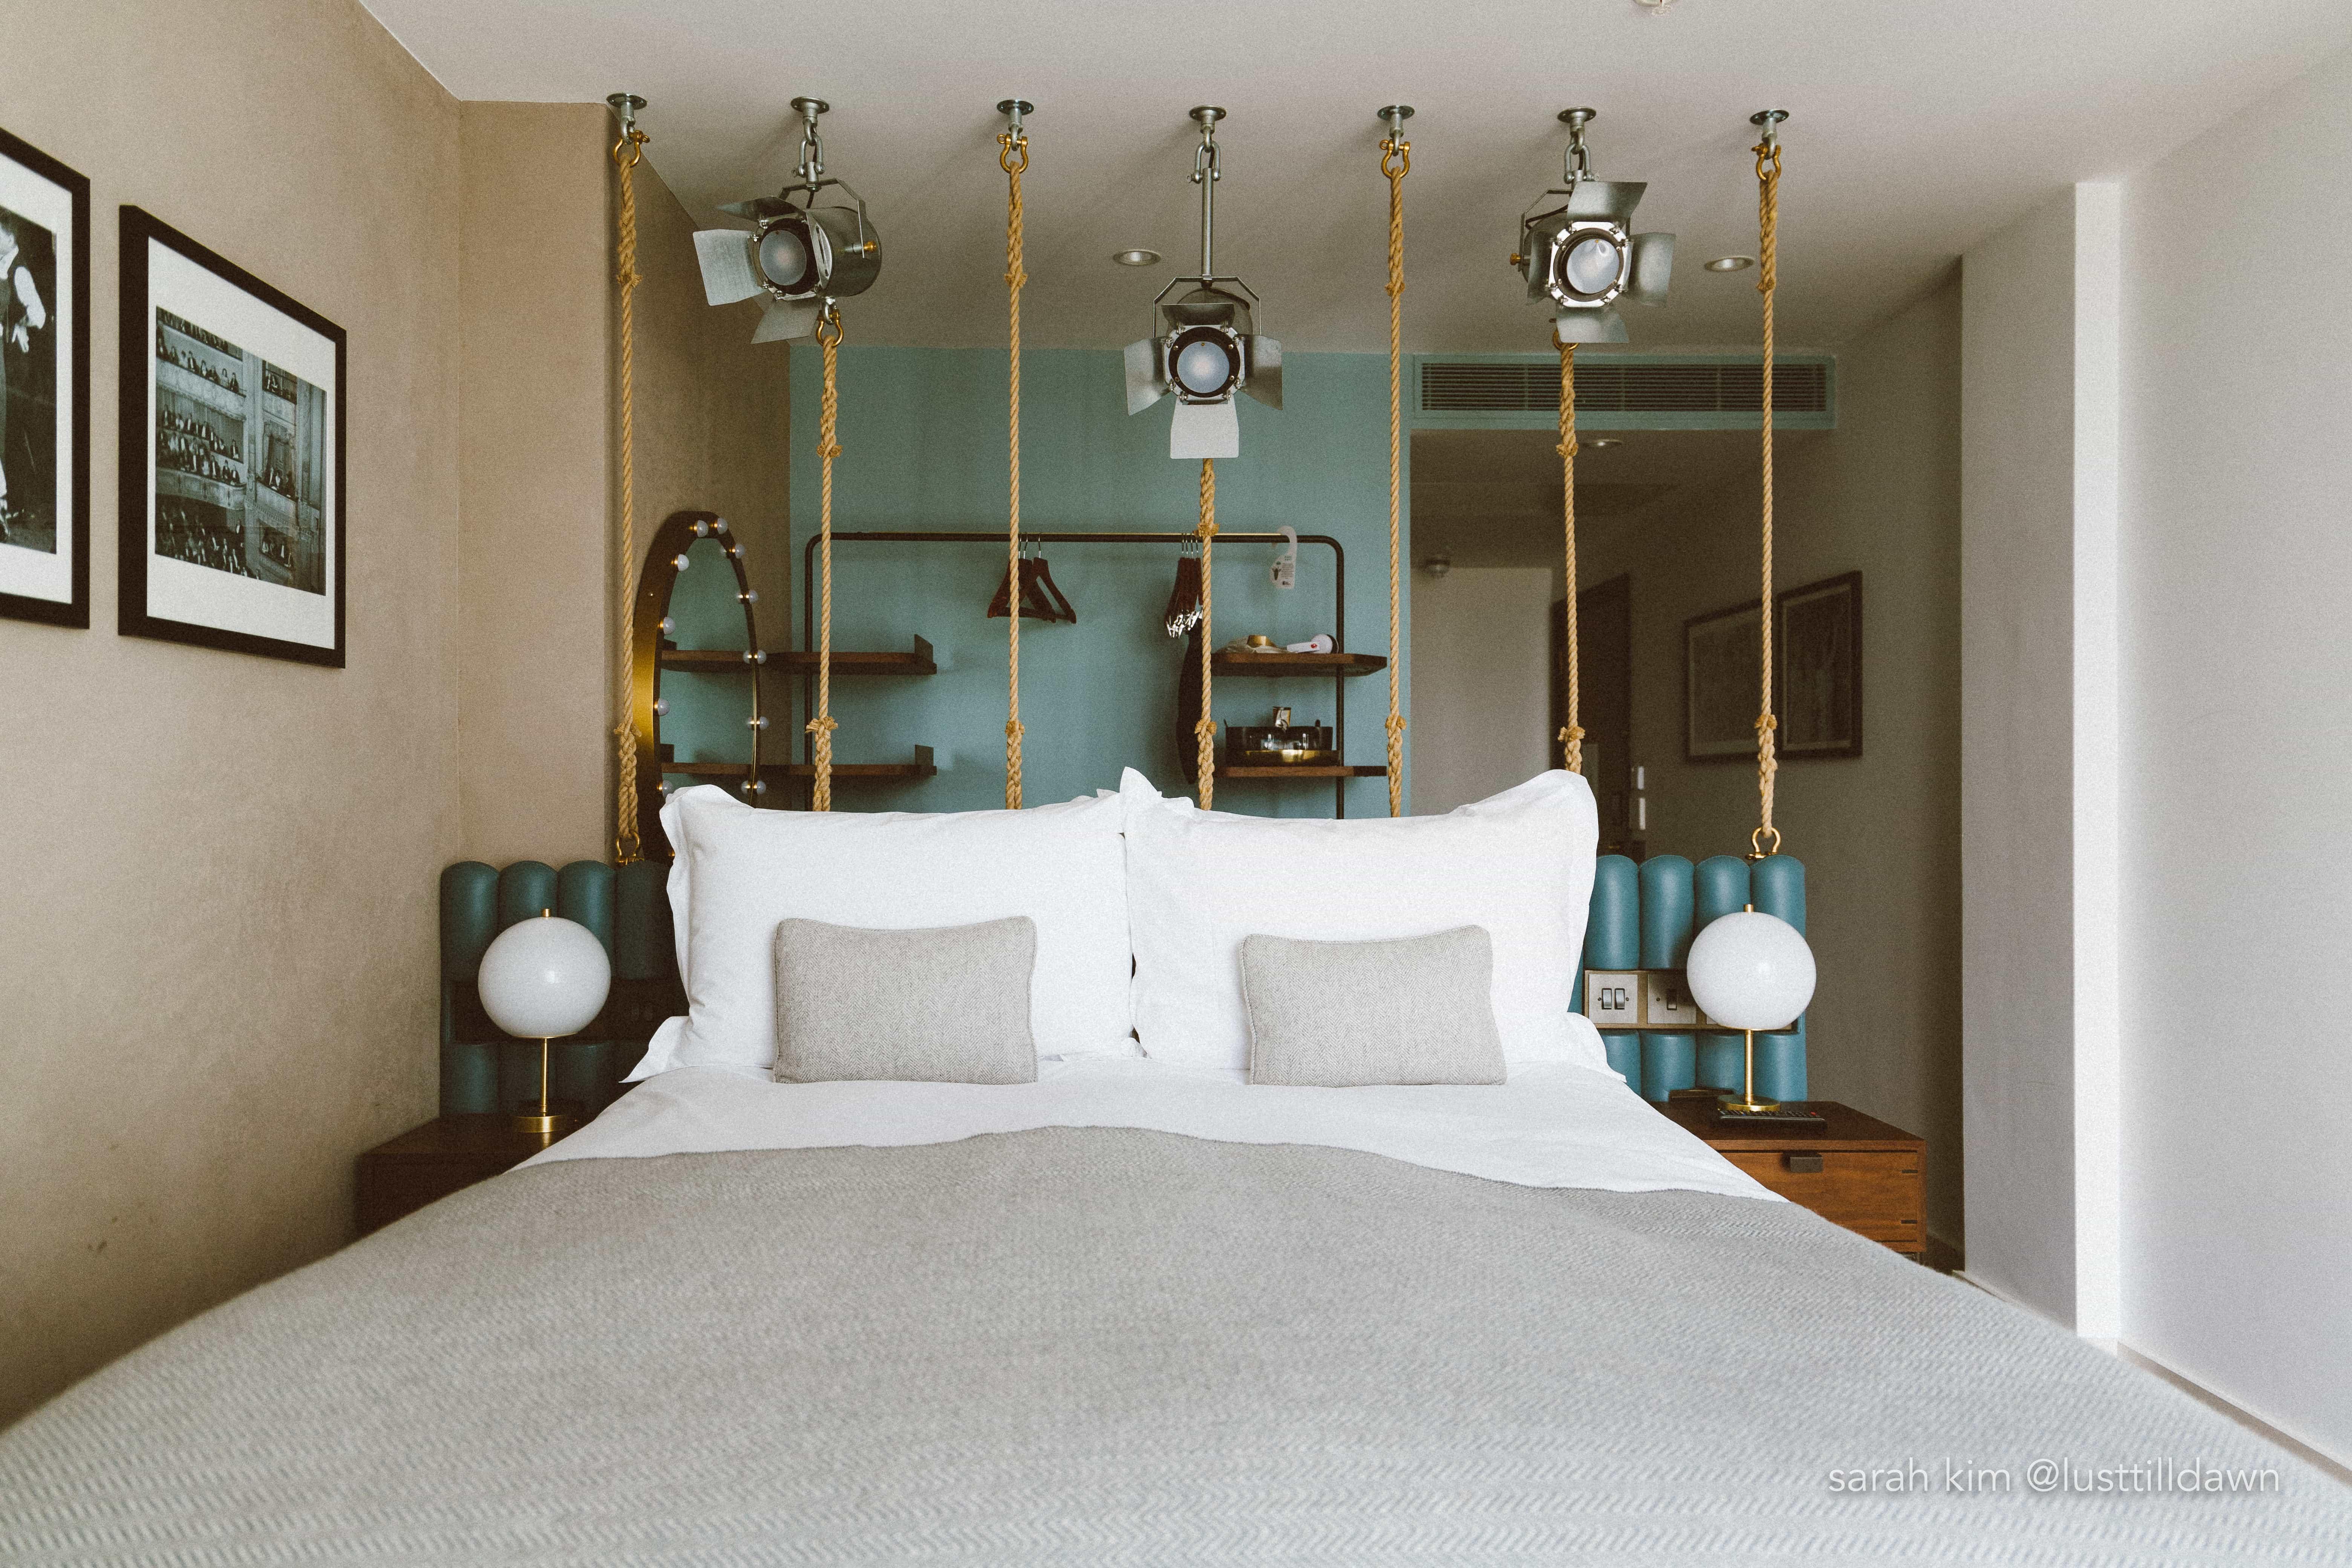 hotel indigo leicester square bed room